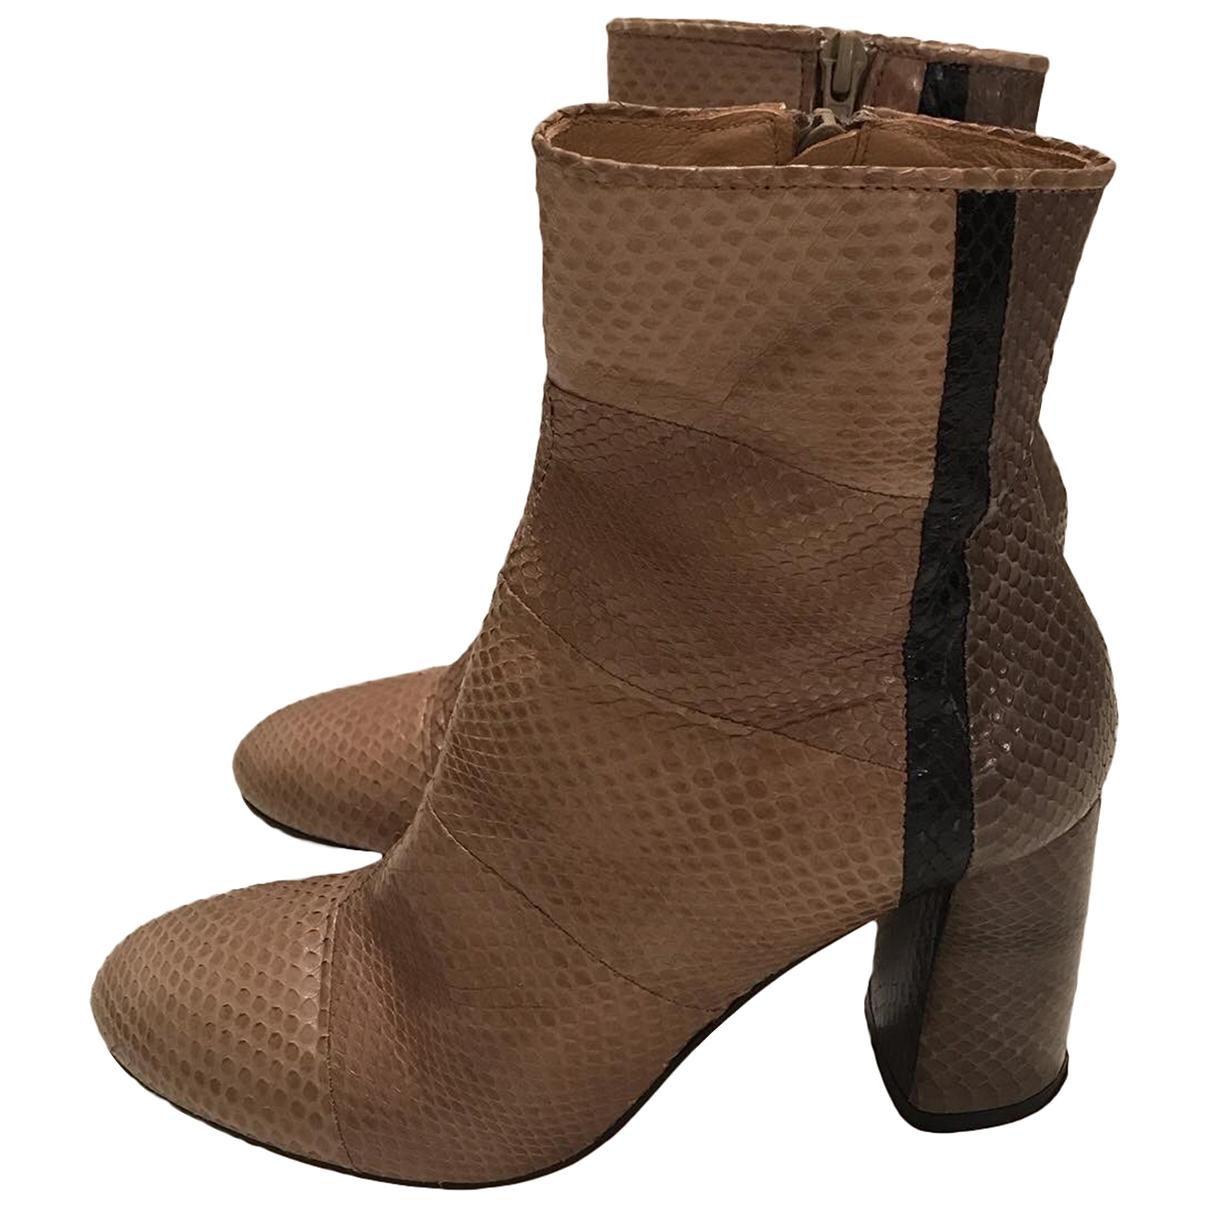 Maliparmi \N Beige Python Ankle boots for Women 37 EU